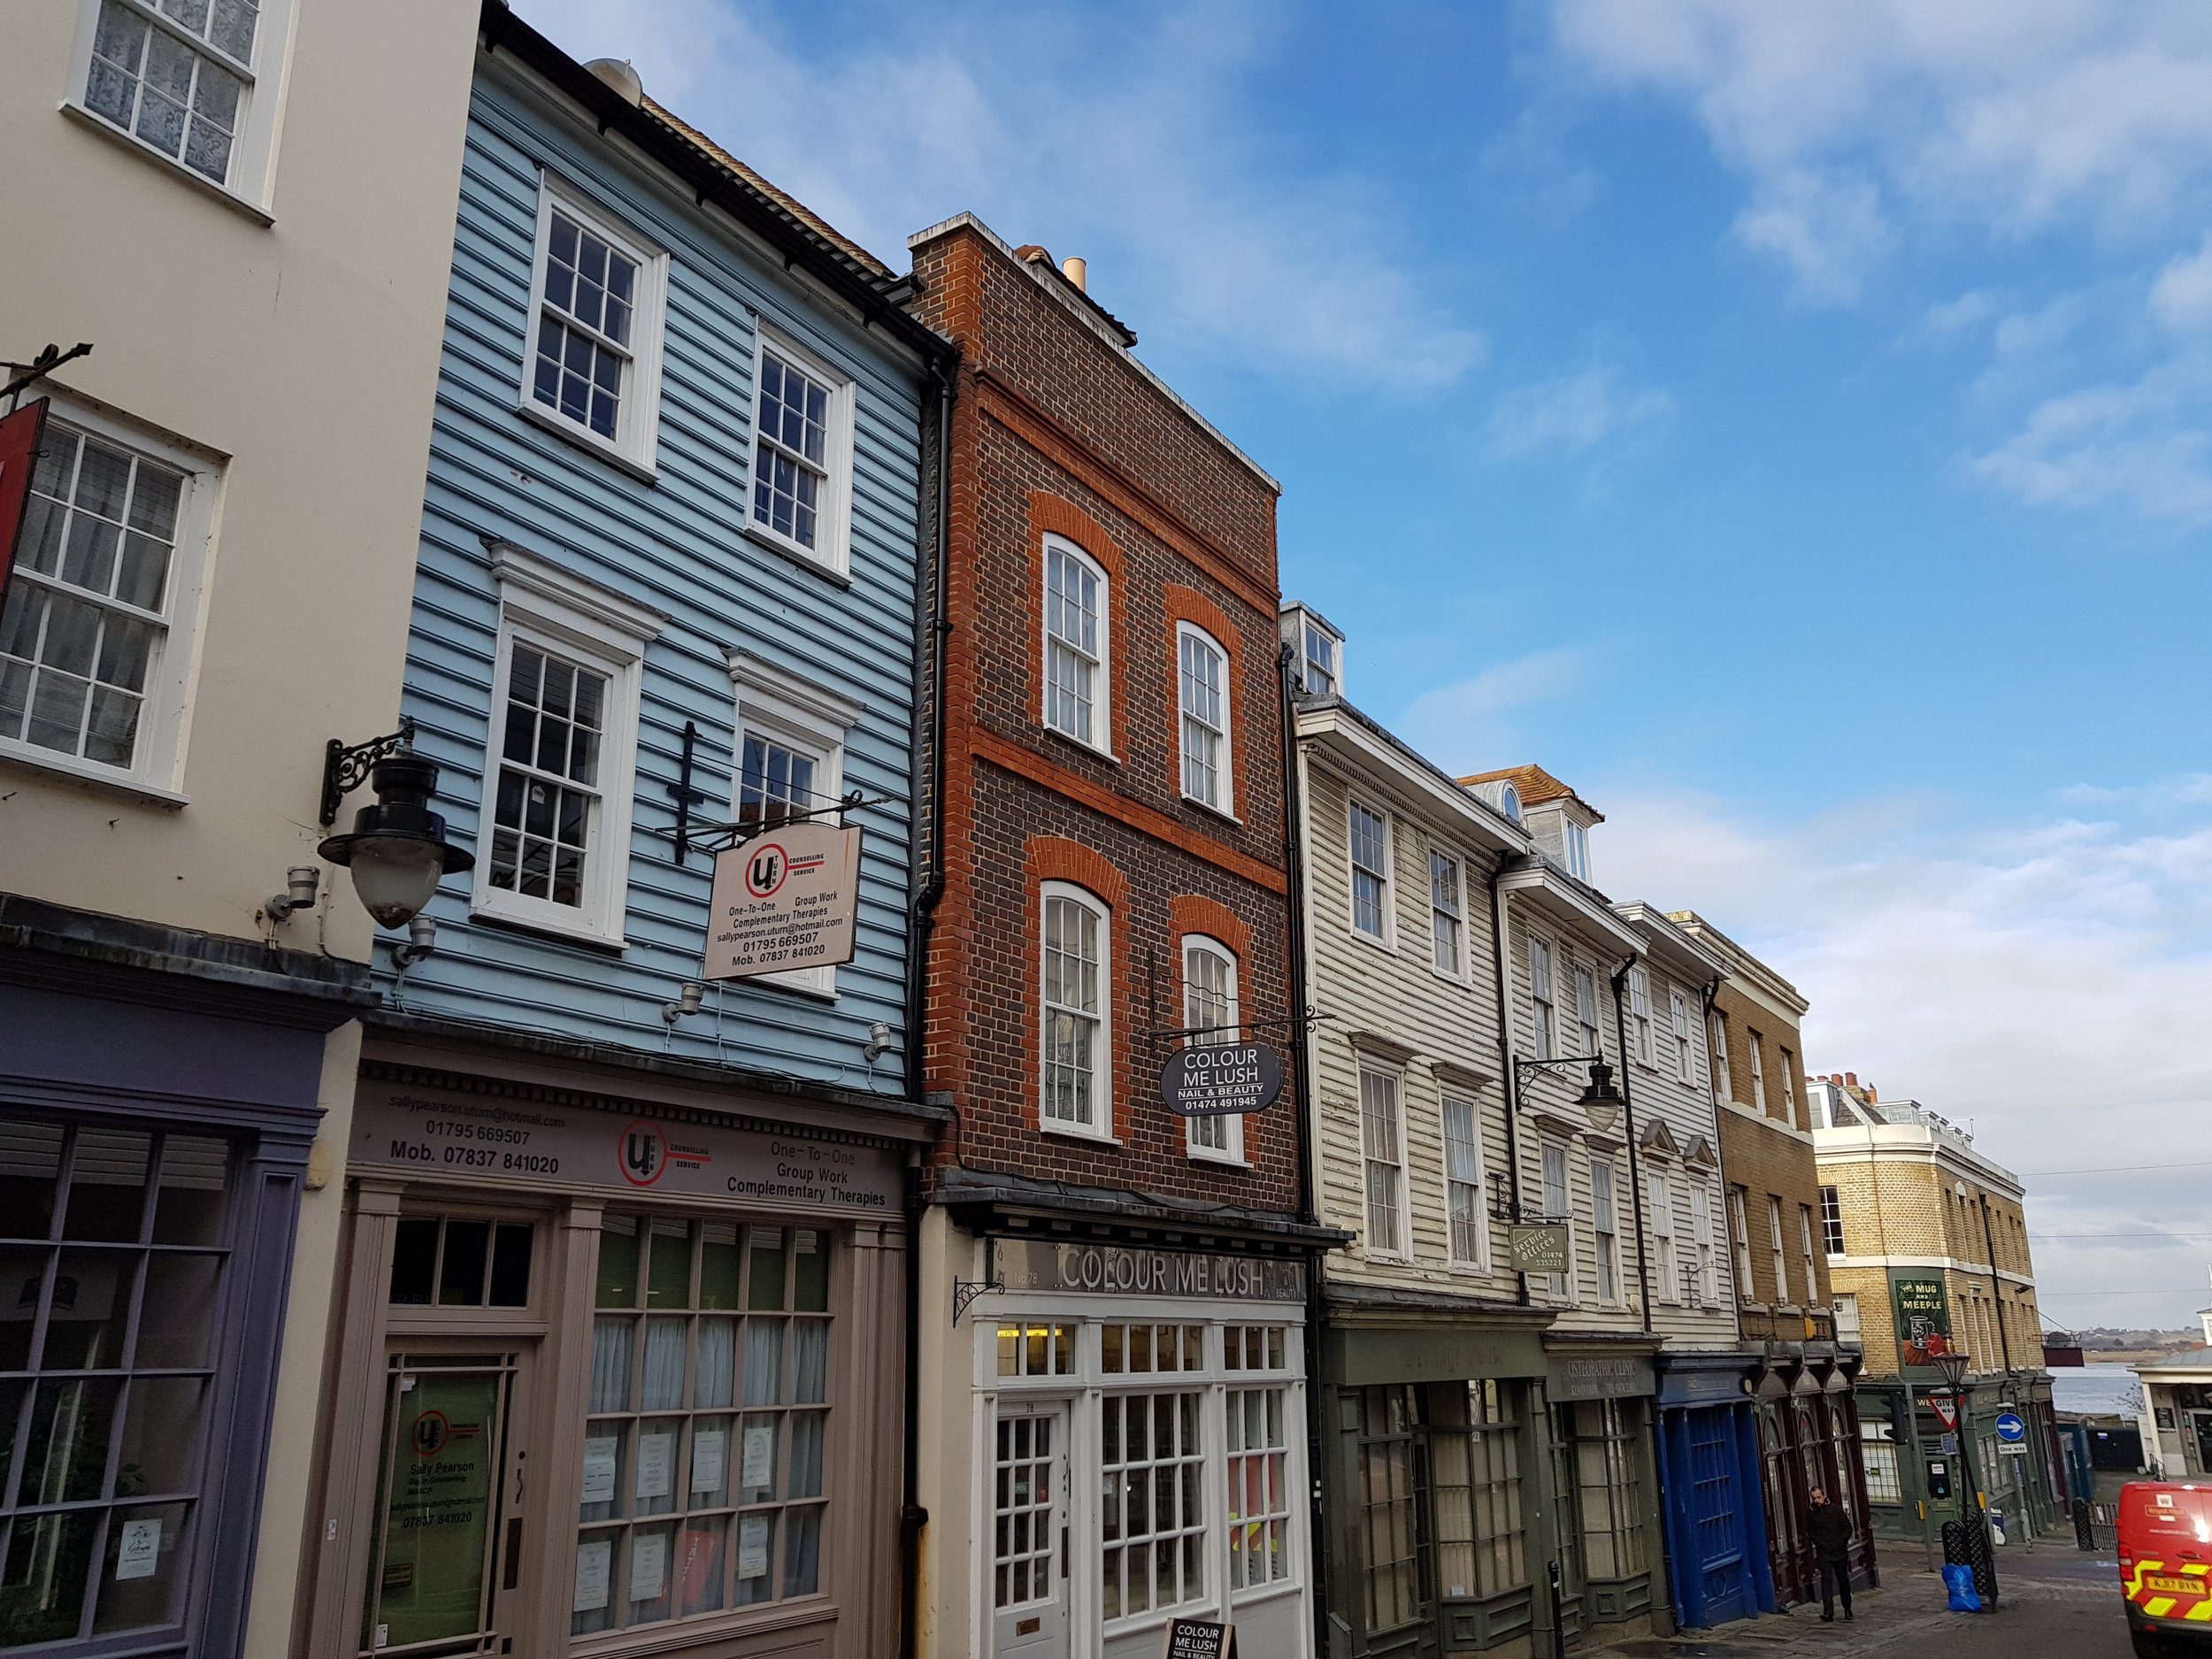 High Street - 3 storeys plus attic storey - mixed used ground level -